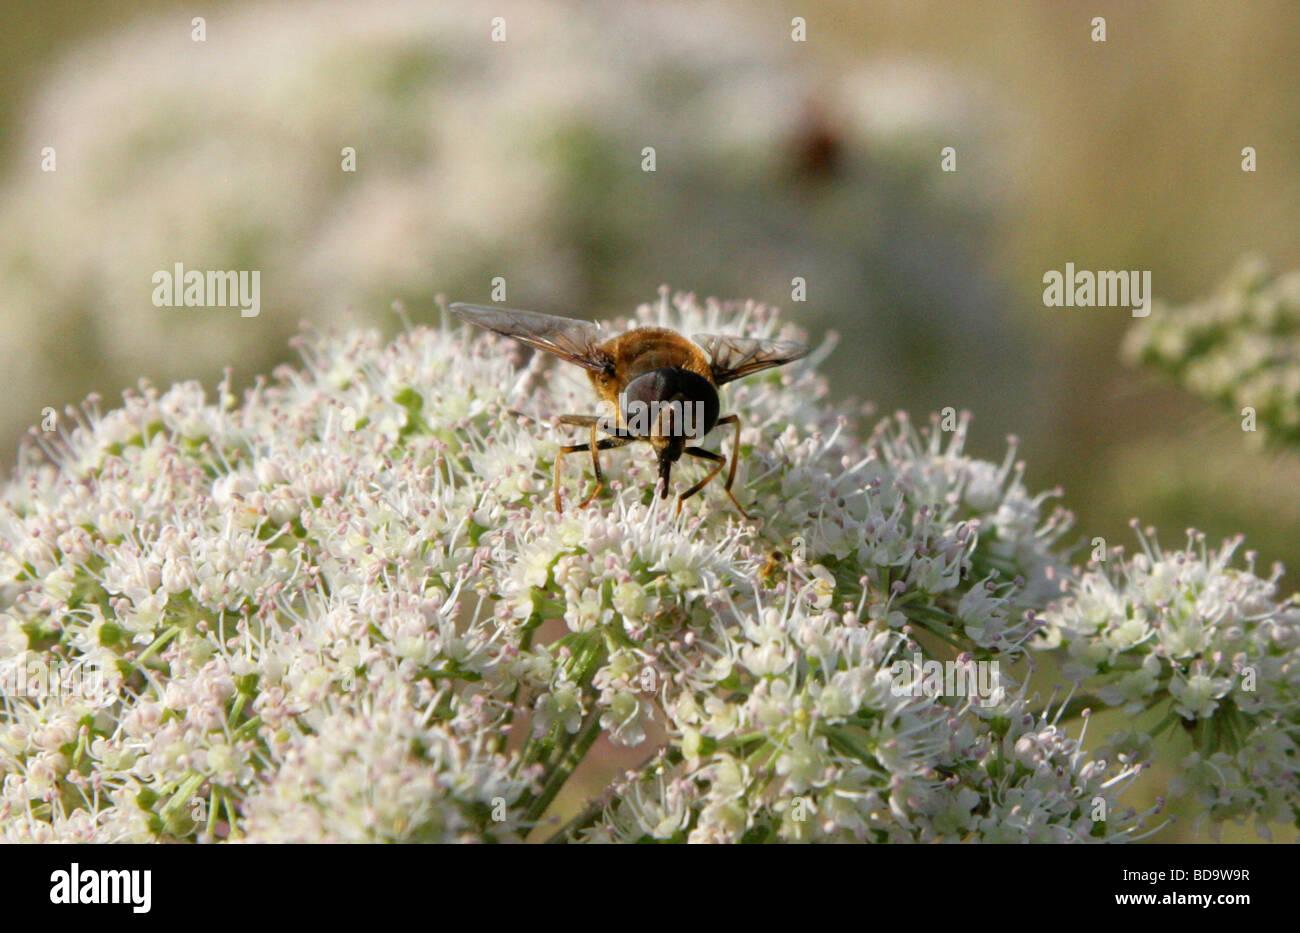 Honeybee Mimic Dronefly or Hoverfly, Eristalis pertinax, Diptera - Stock Image